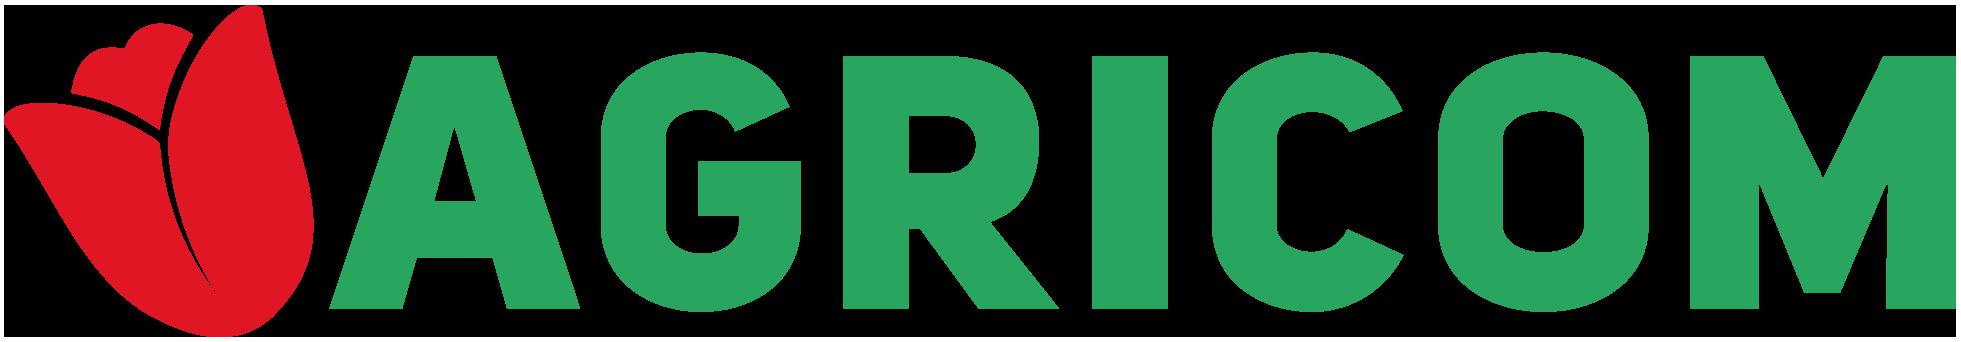 AGRICOM-logo-web